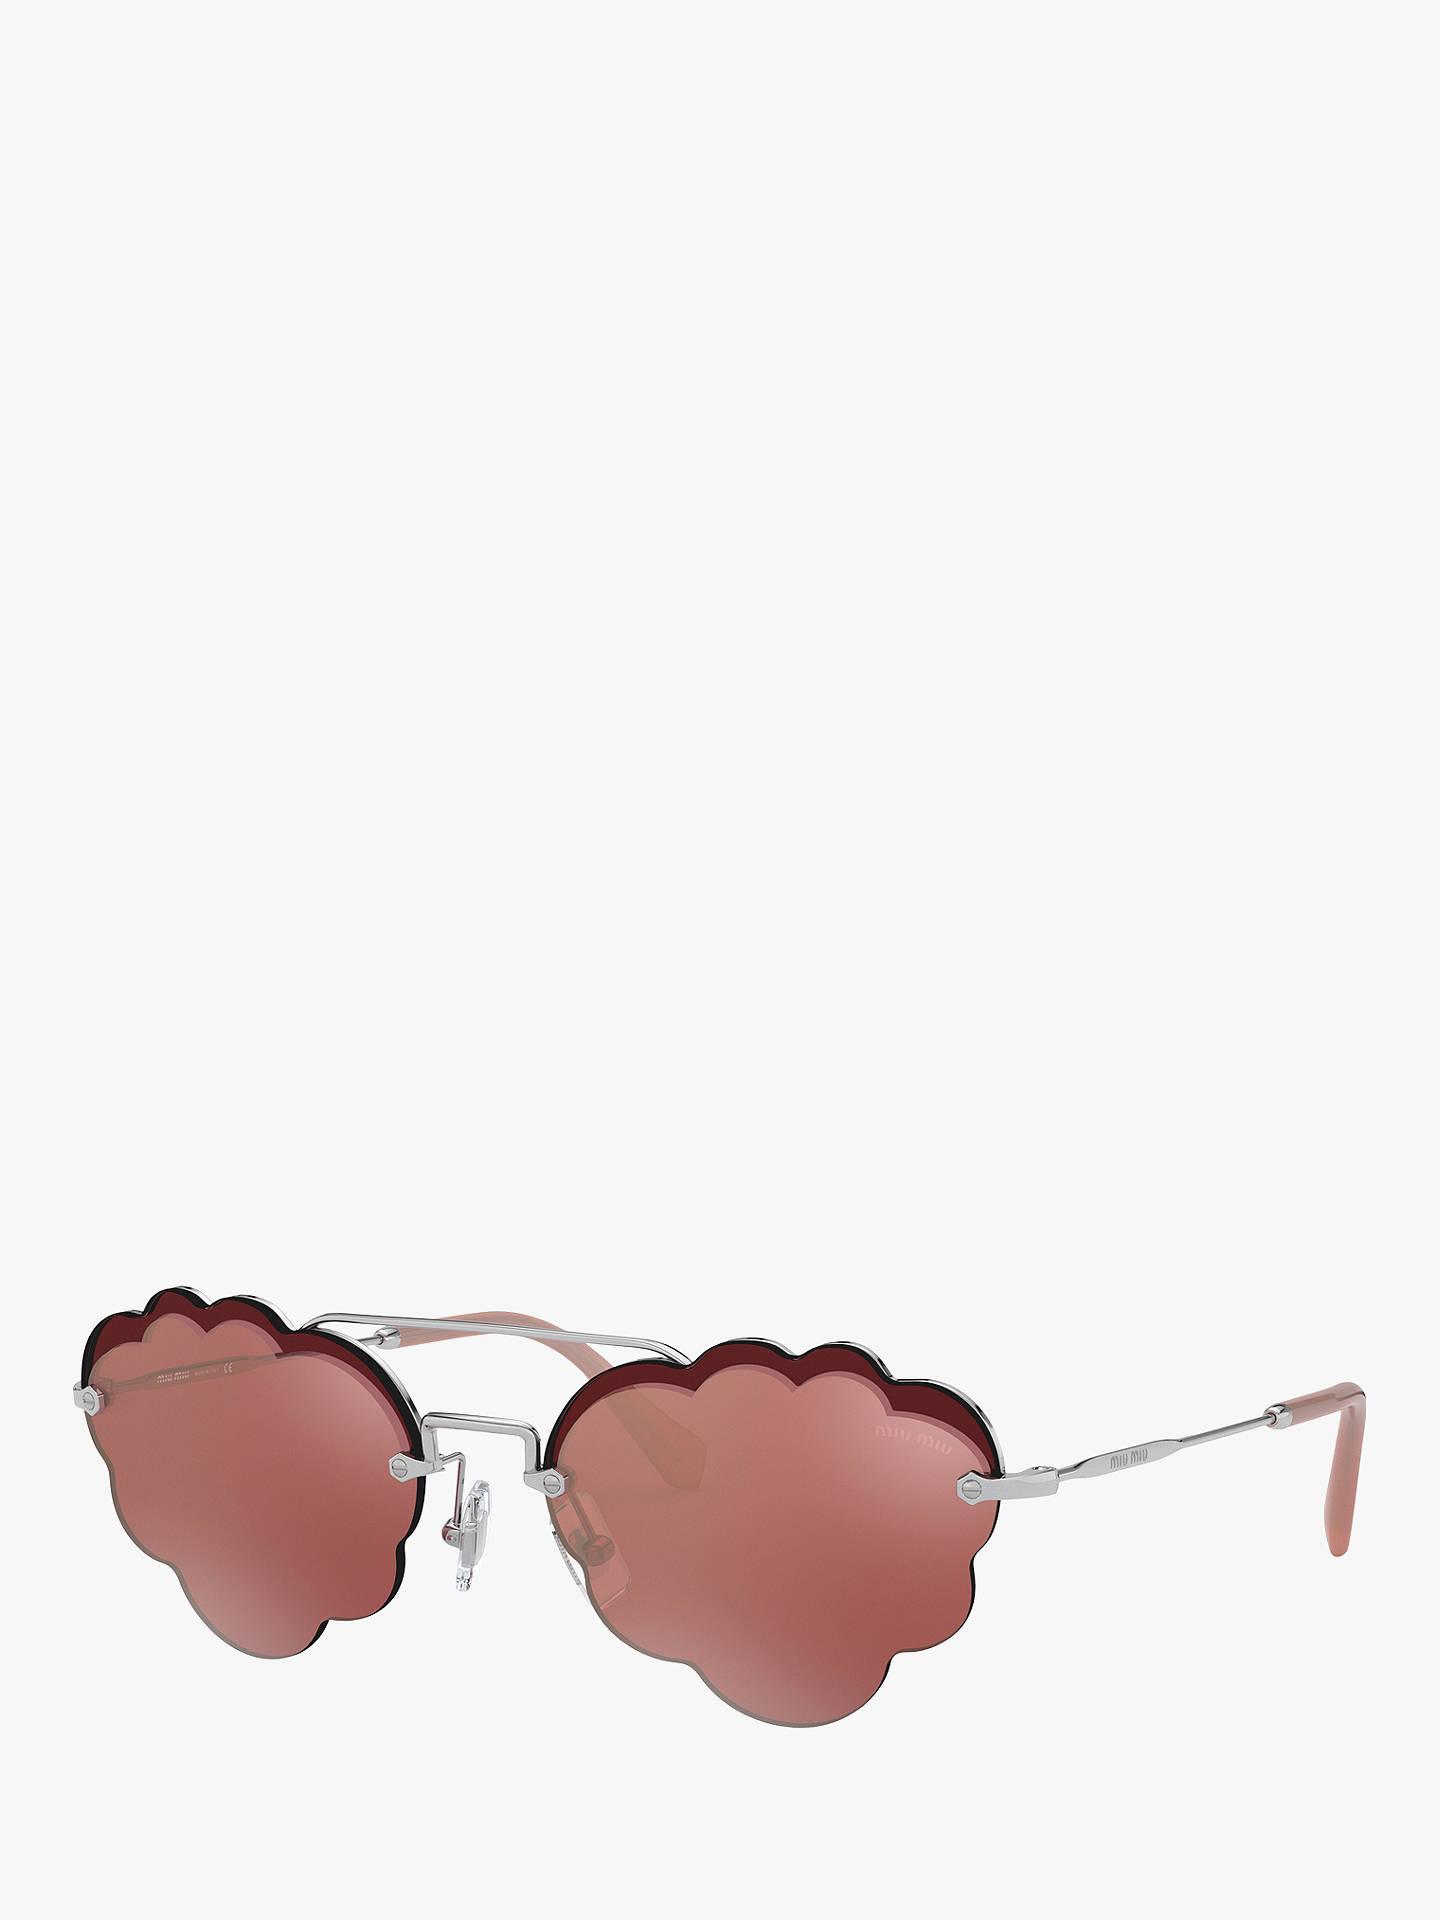 2120459a5 Buy Miu Miu 57US Women's Cloud Aviator Sunglasses, Pink/Silver Online at  johnlewis.